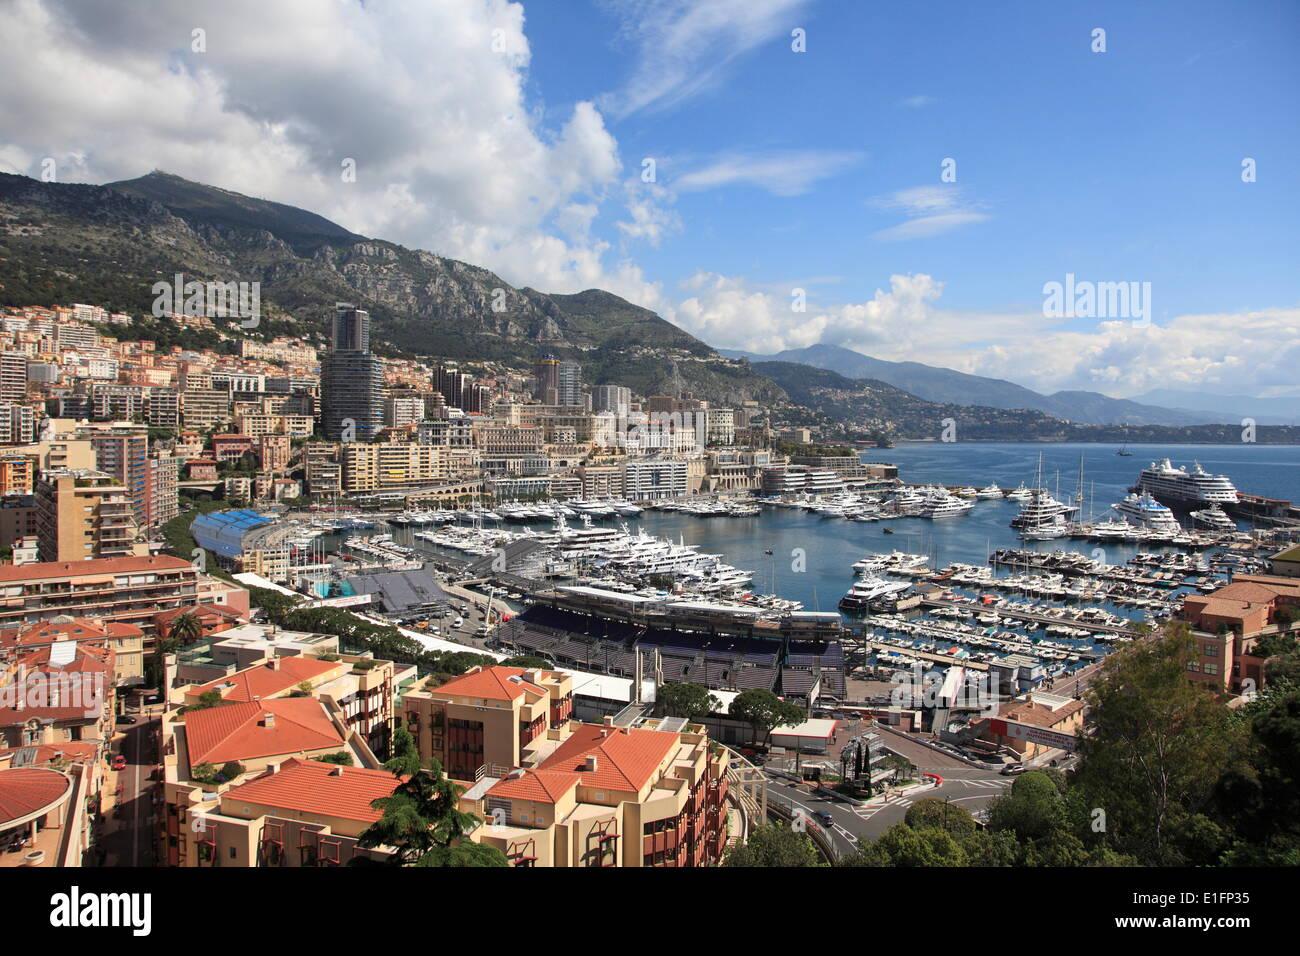 Port Hercule, Harbor, Monte Carlo, Monaco, Cote d'Azur, Mediterranean, Europe - Stock Image